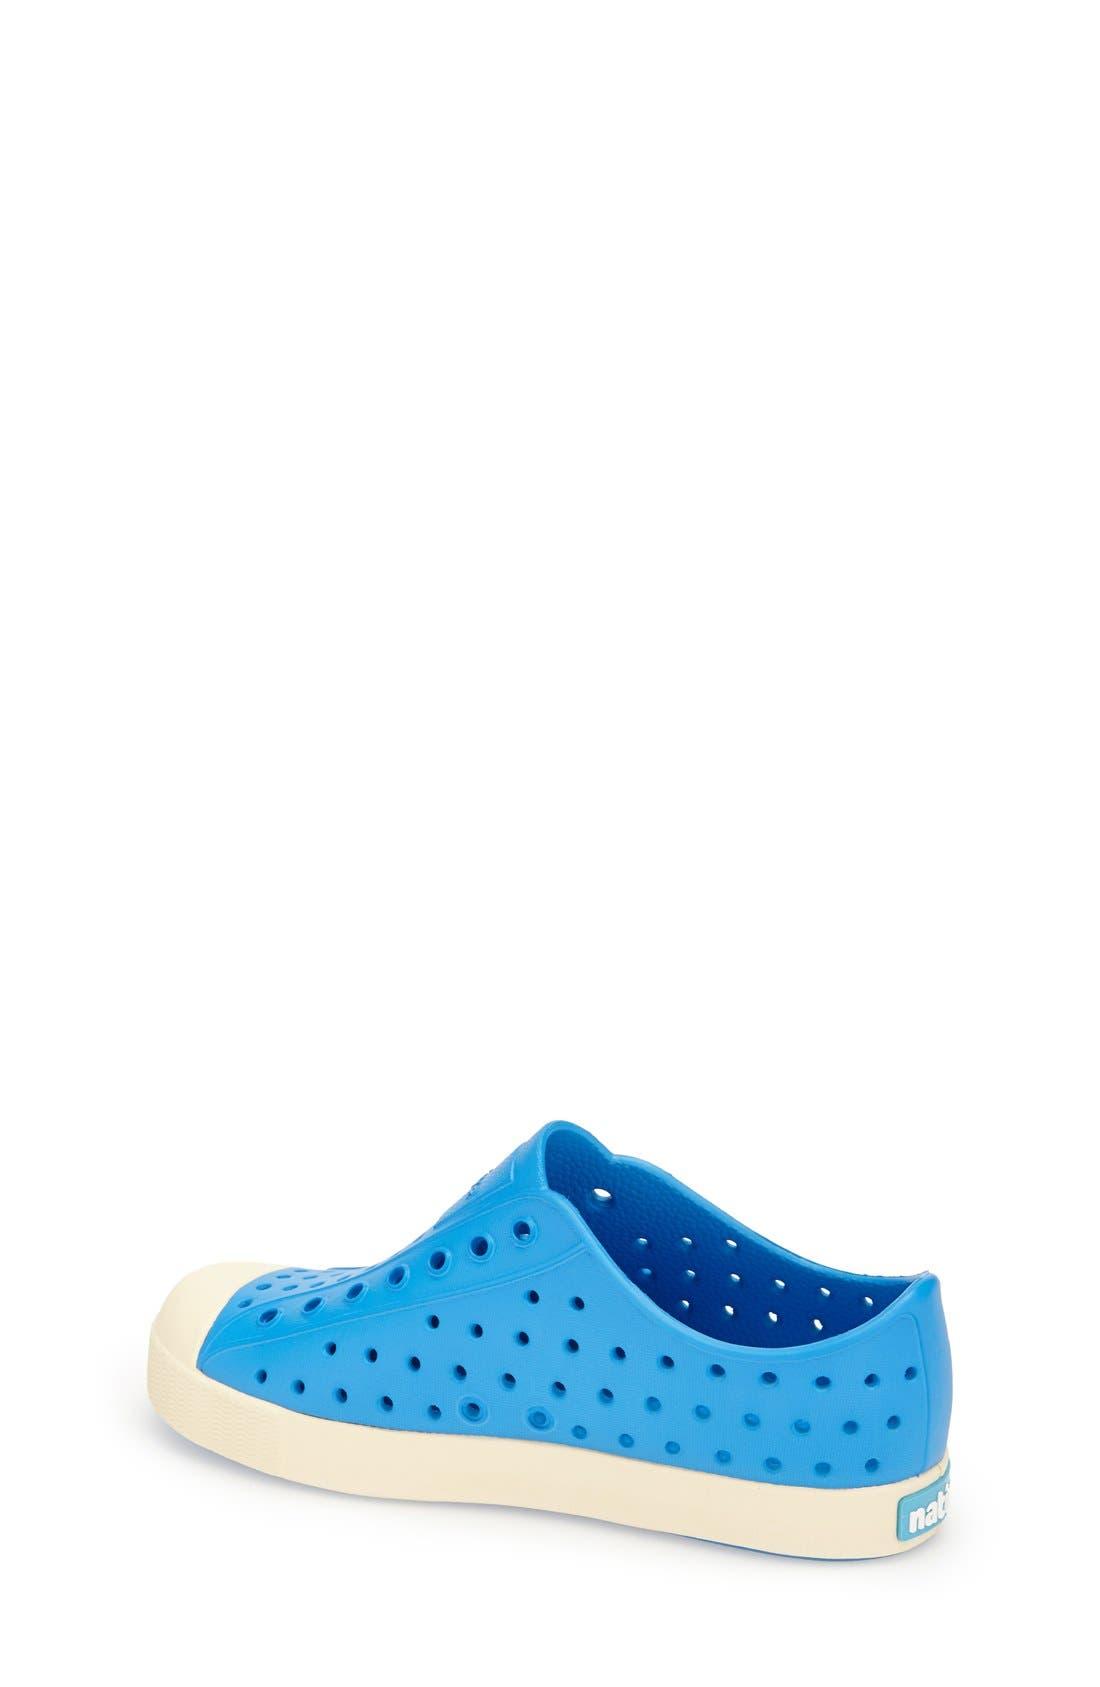 'Jefferson' Water Friendly Slip-On Sneaker,                             Alternate thumbnail 102, color,